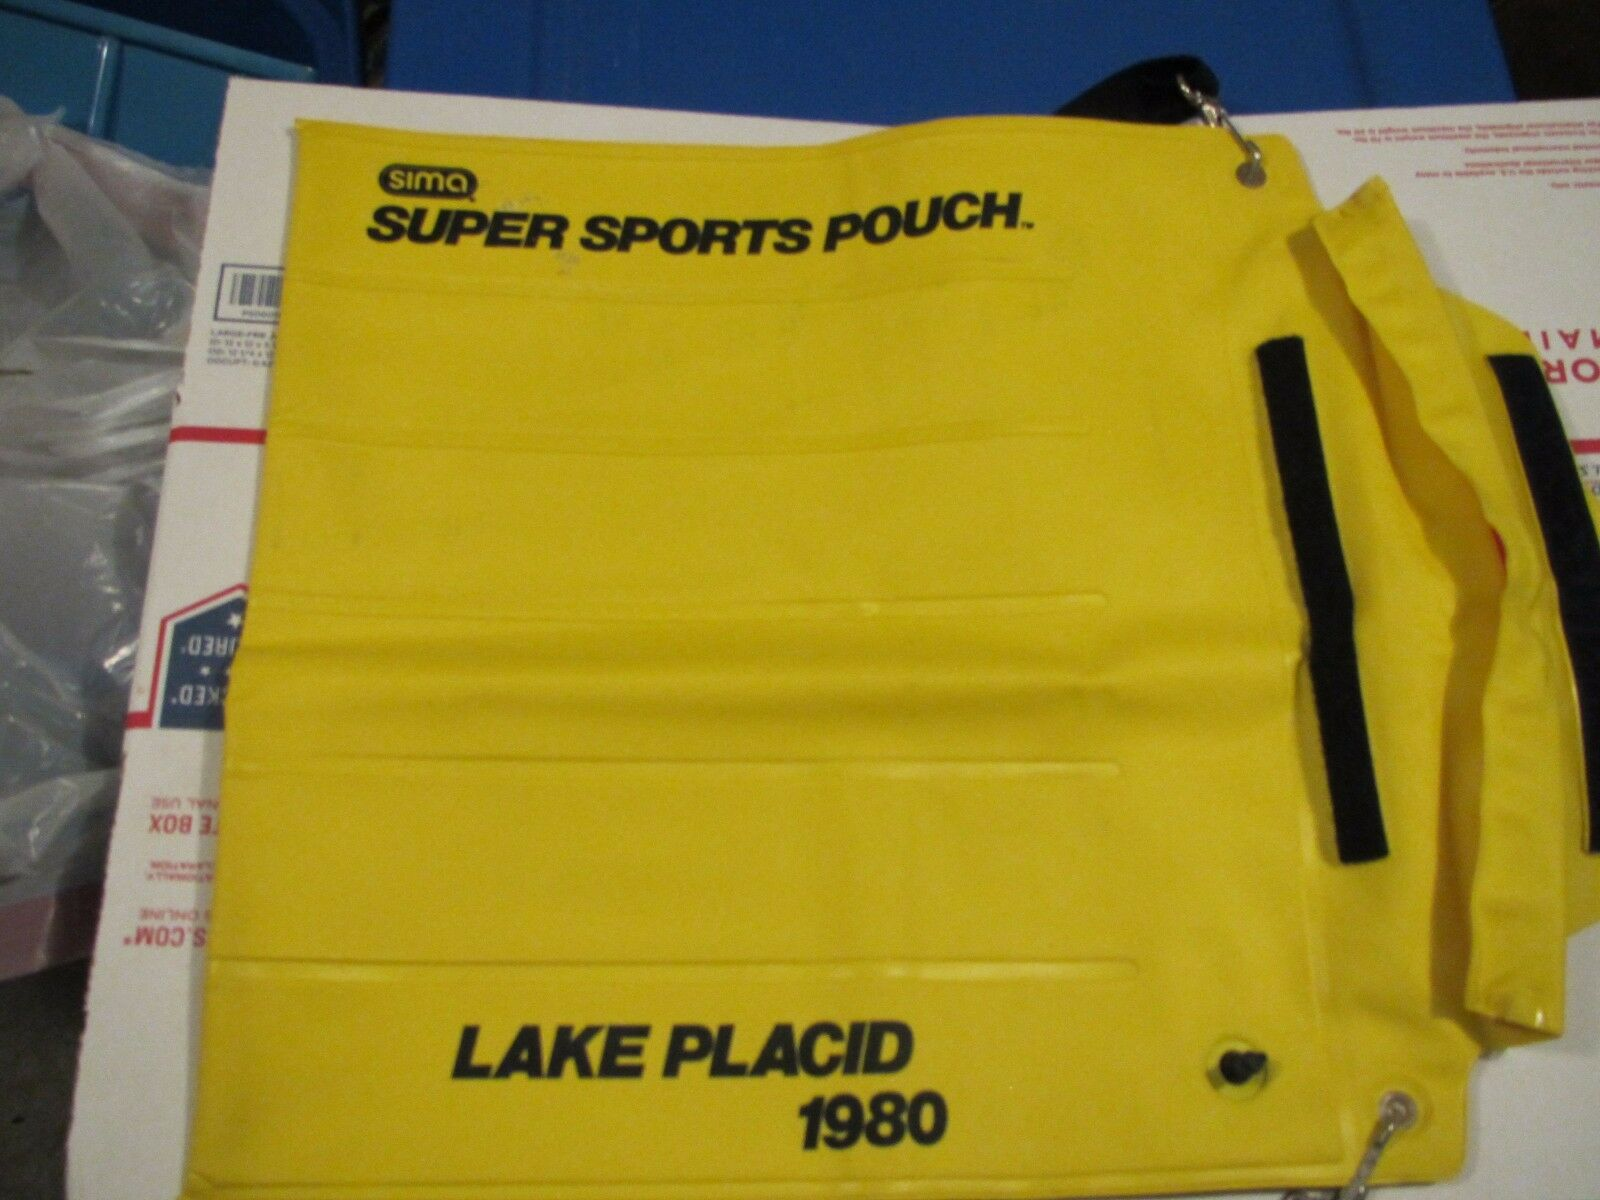 Sima Inflatable Super Sports Pouch - Lake Placid 1980 Comemerative